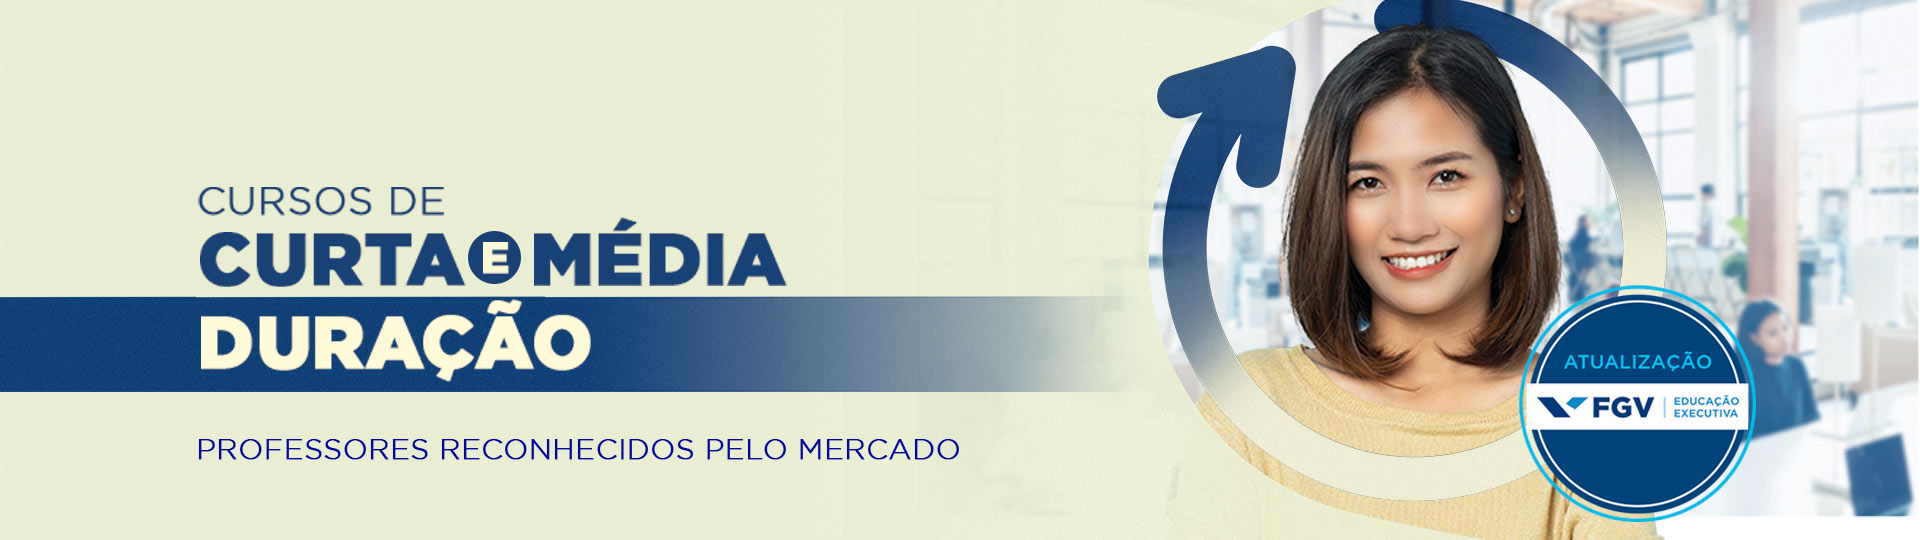 MBA Porto Alegre FGV Decision